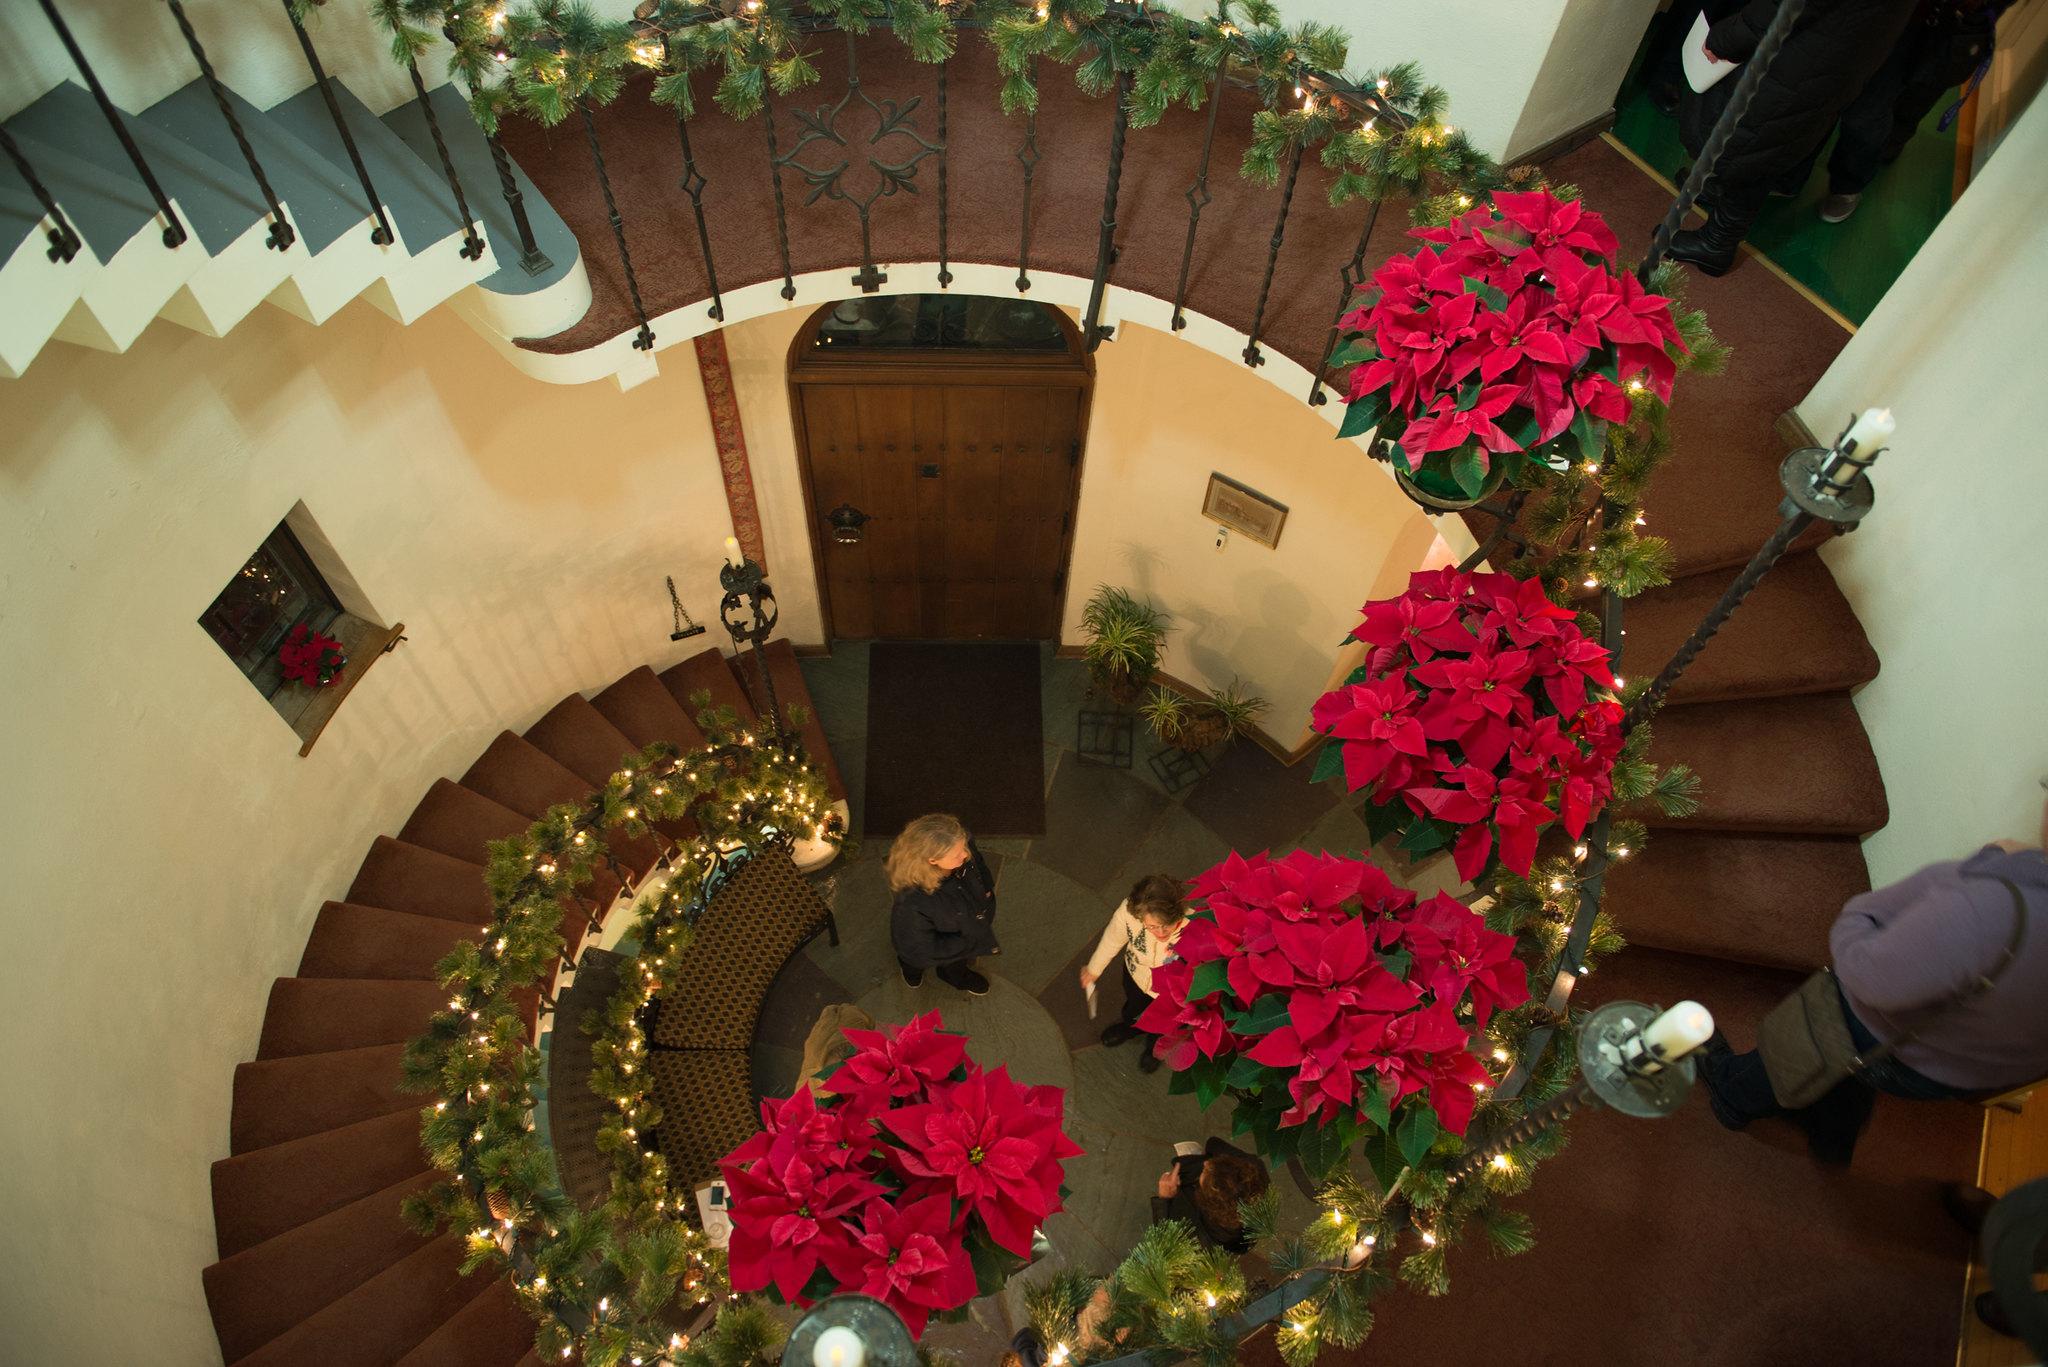 poinsettias don the spiral staircase